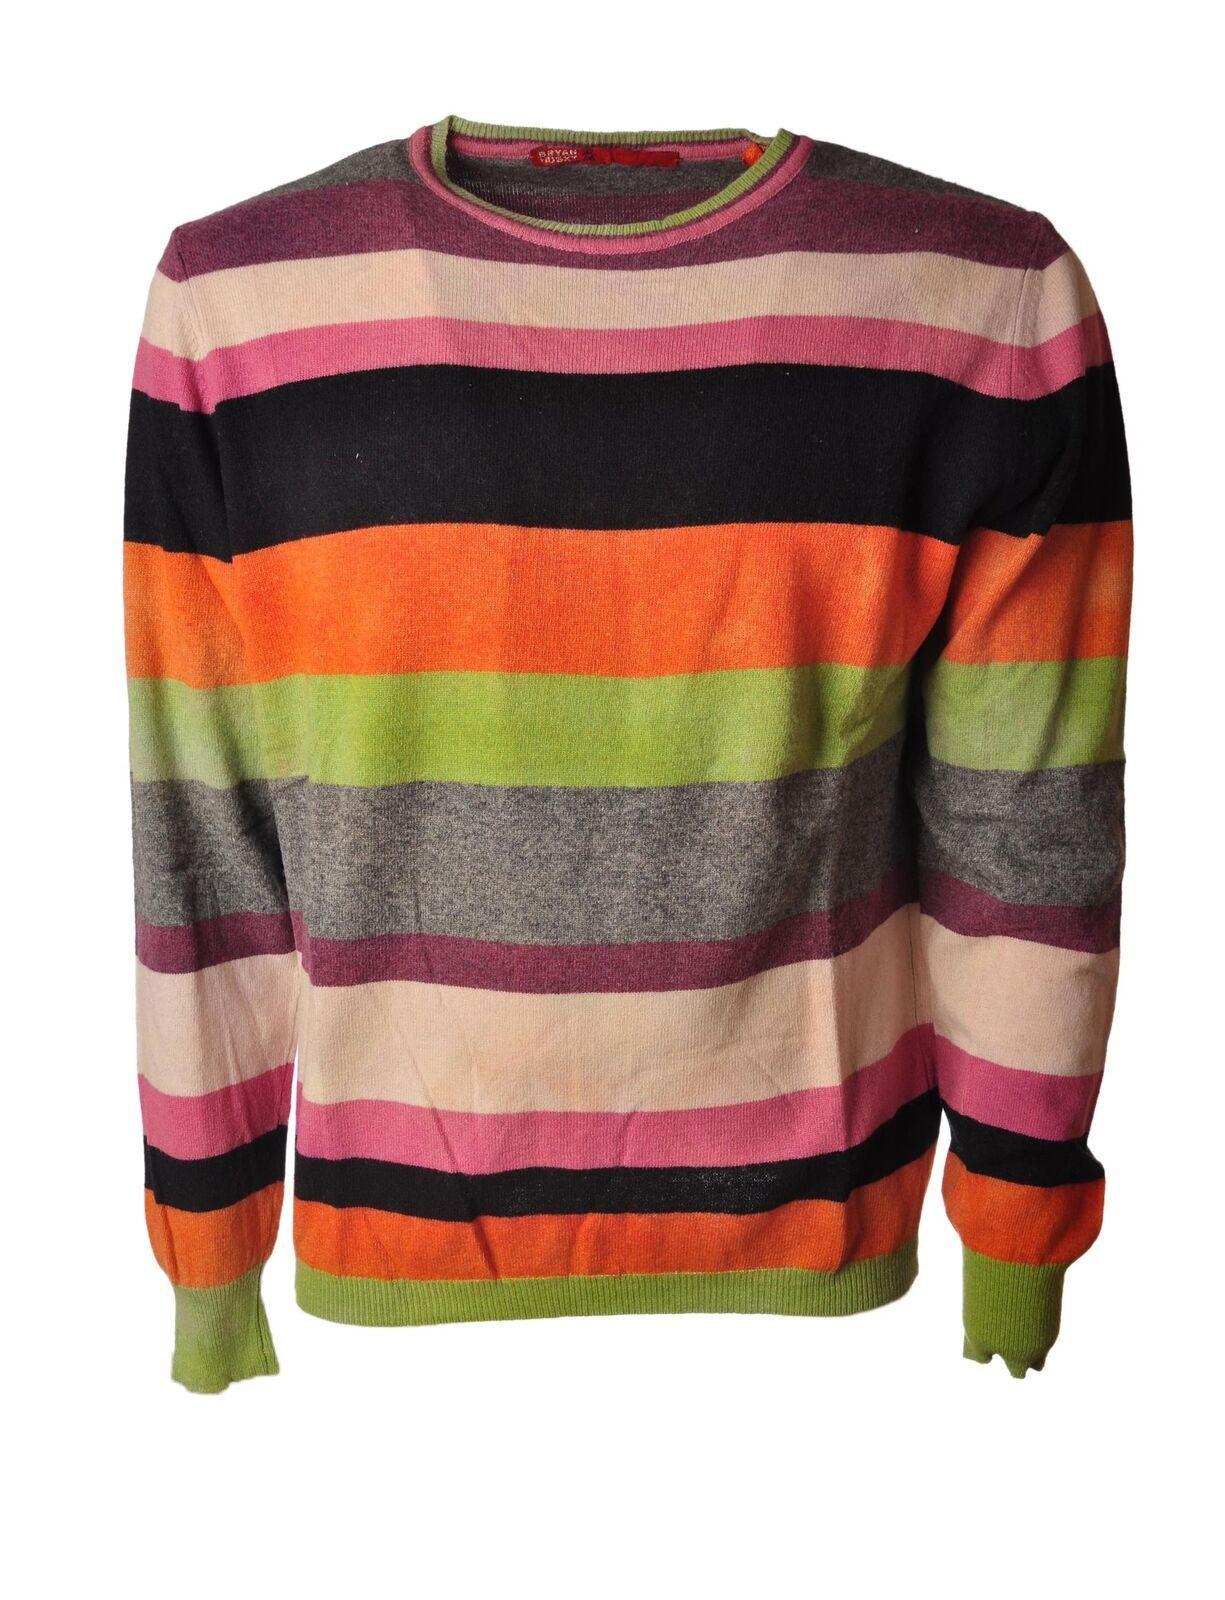 Bryan Husky  -  Sweaters - Male - Fantasy - 4510624A180114